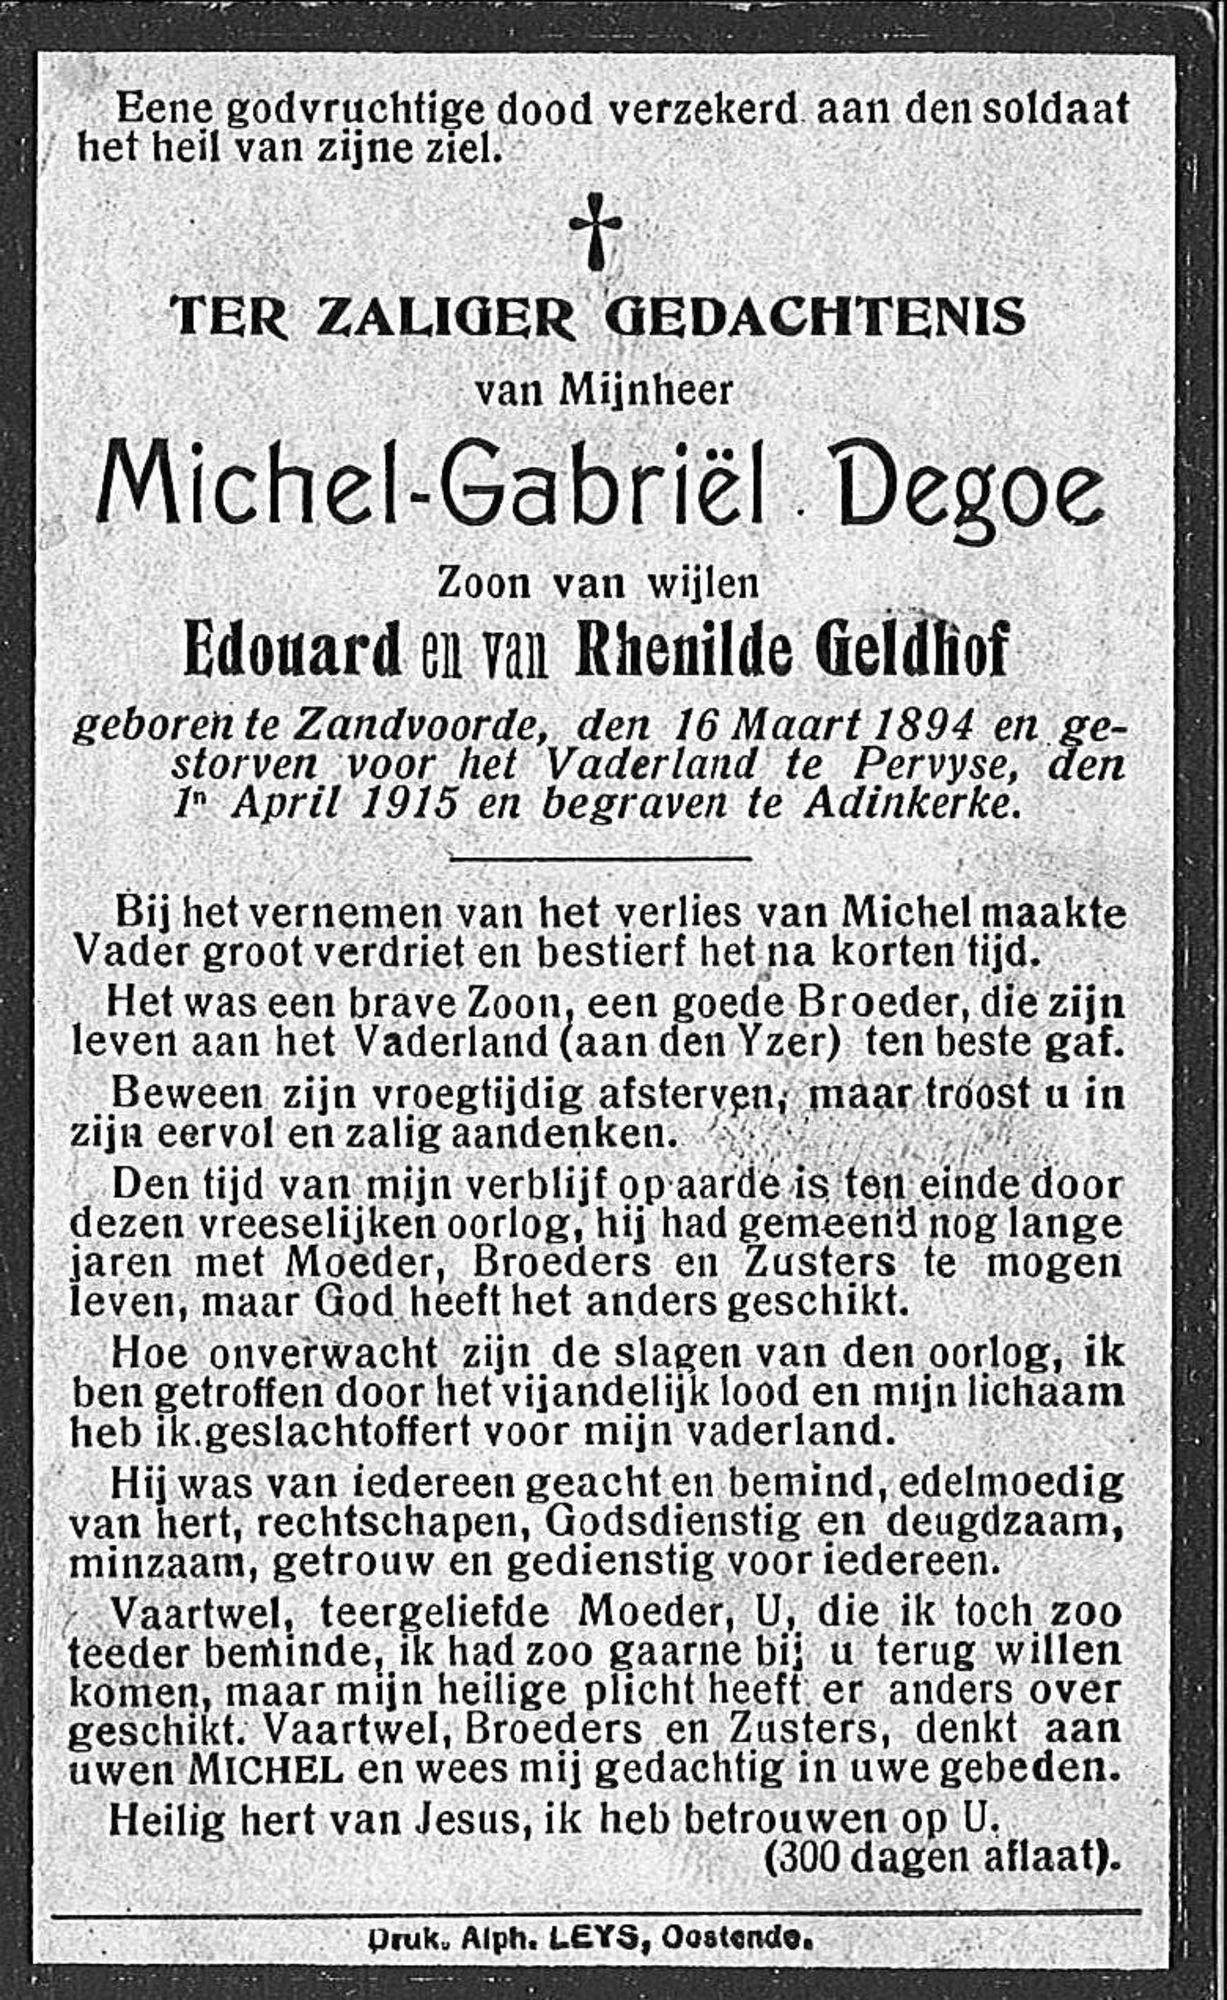 Michel-Gabriël Degoe